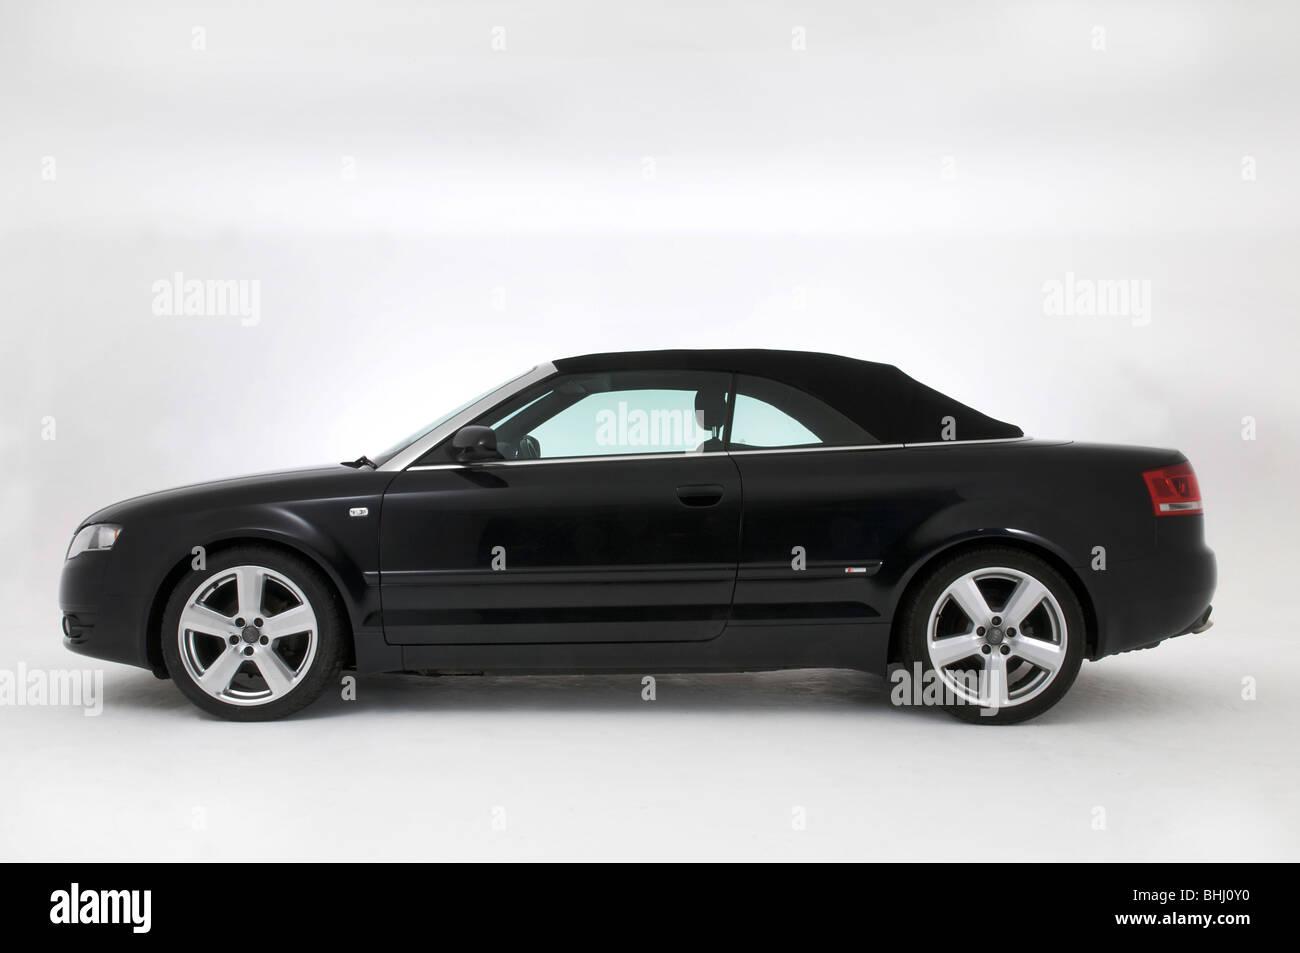 2008 Audi A4 Convertible 2.0 TDi S Line - Stock Image